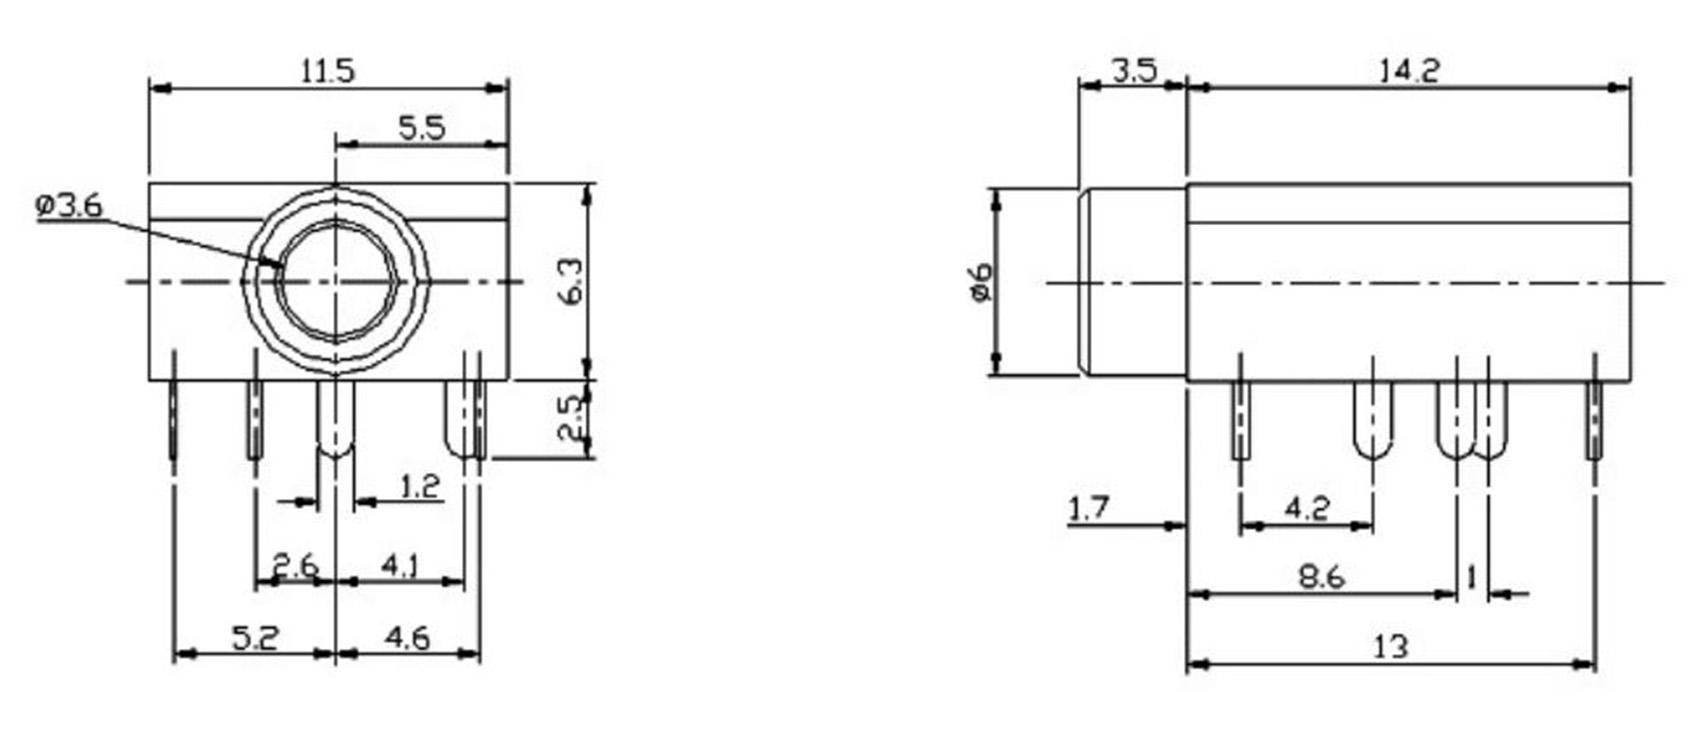 2 x 3.5mm Audio Stereo Headphone Socket 5 Pin PJ-324M PCB